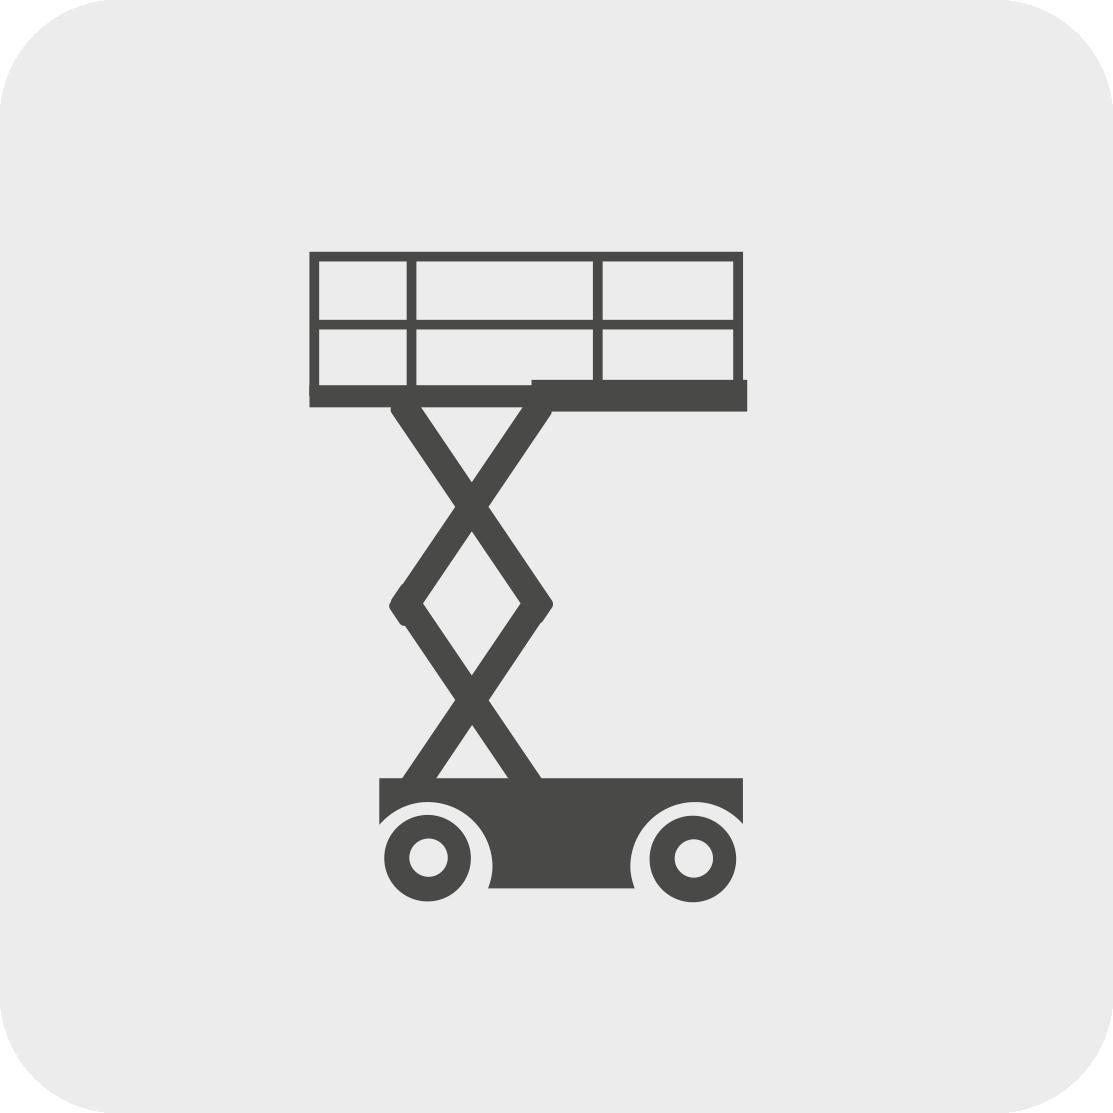 haulotte scissor lifts electric diesel rough terrain optimum compact